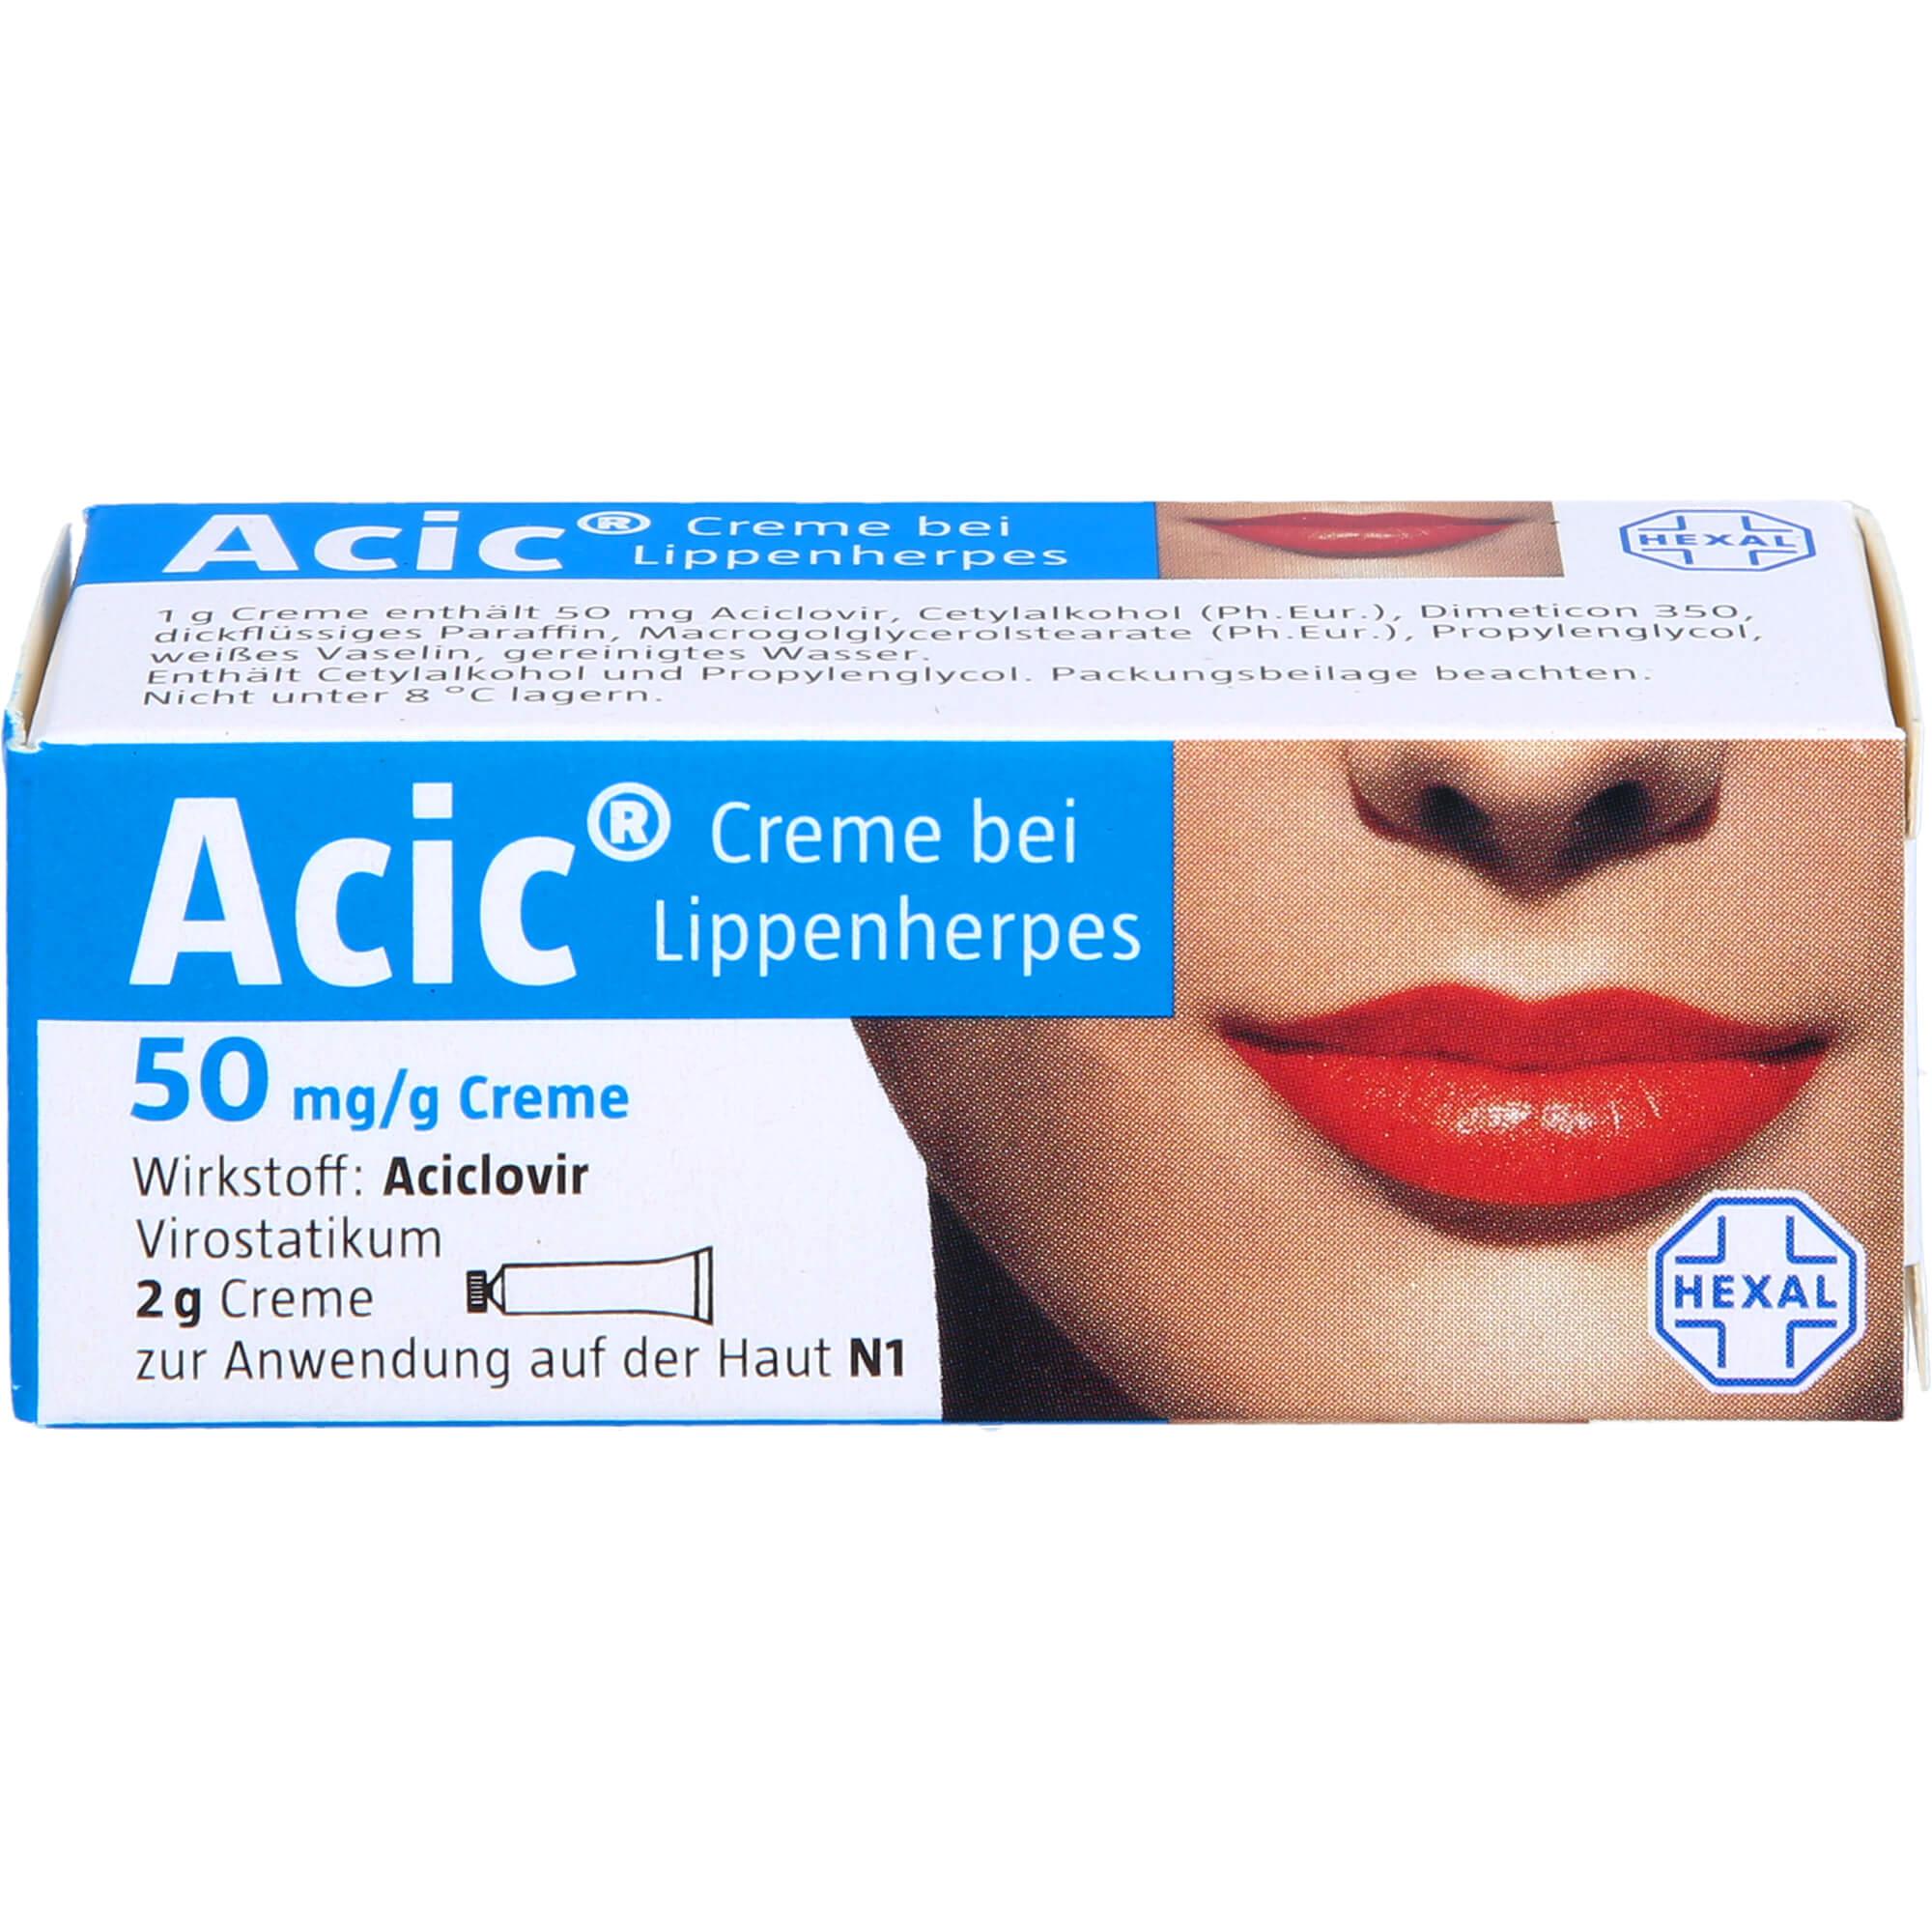 ACIC Creme bei Lippenherpes